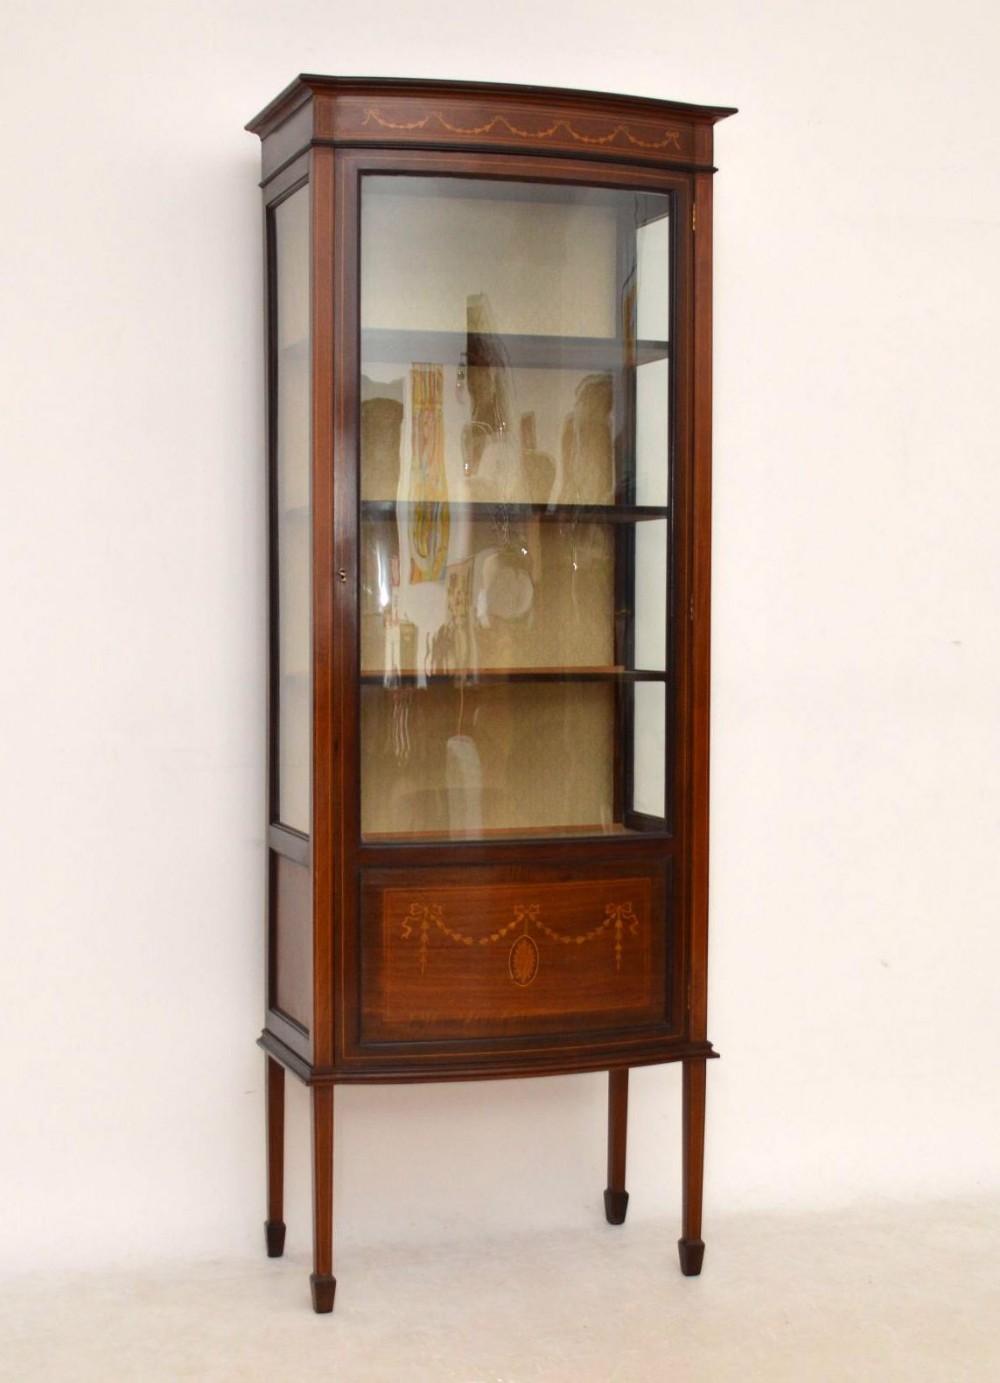 antique edwardian inlaid mahogany display cabinet - Antique Edwardian Inlaid Mahogany Display Cabinet 318153